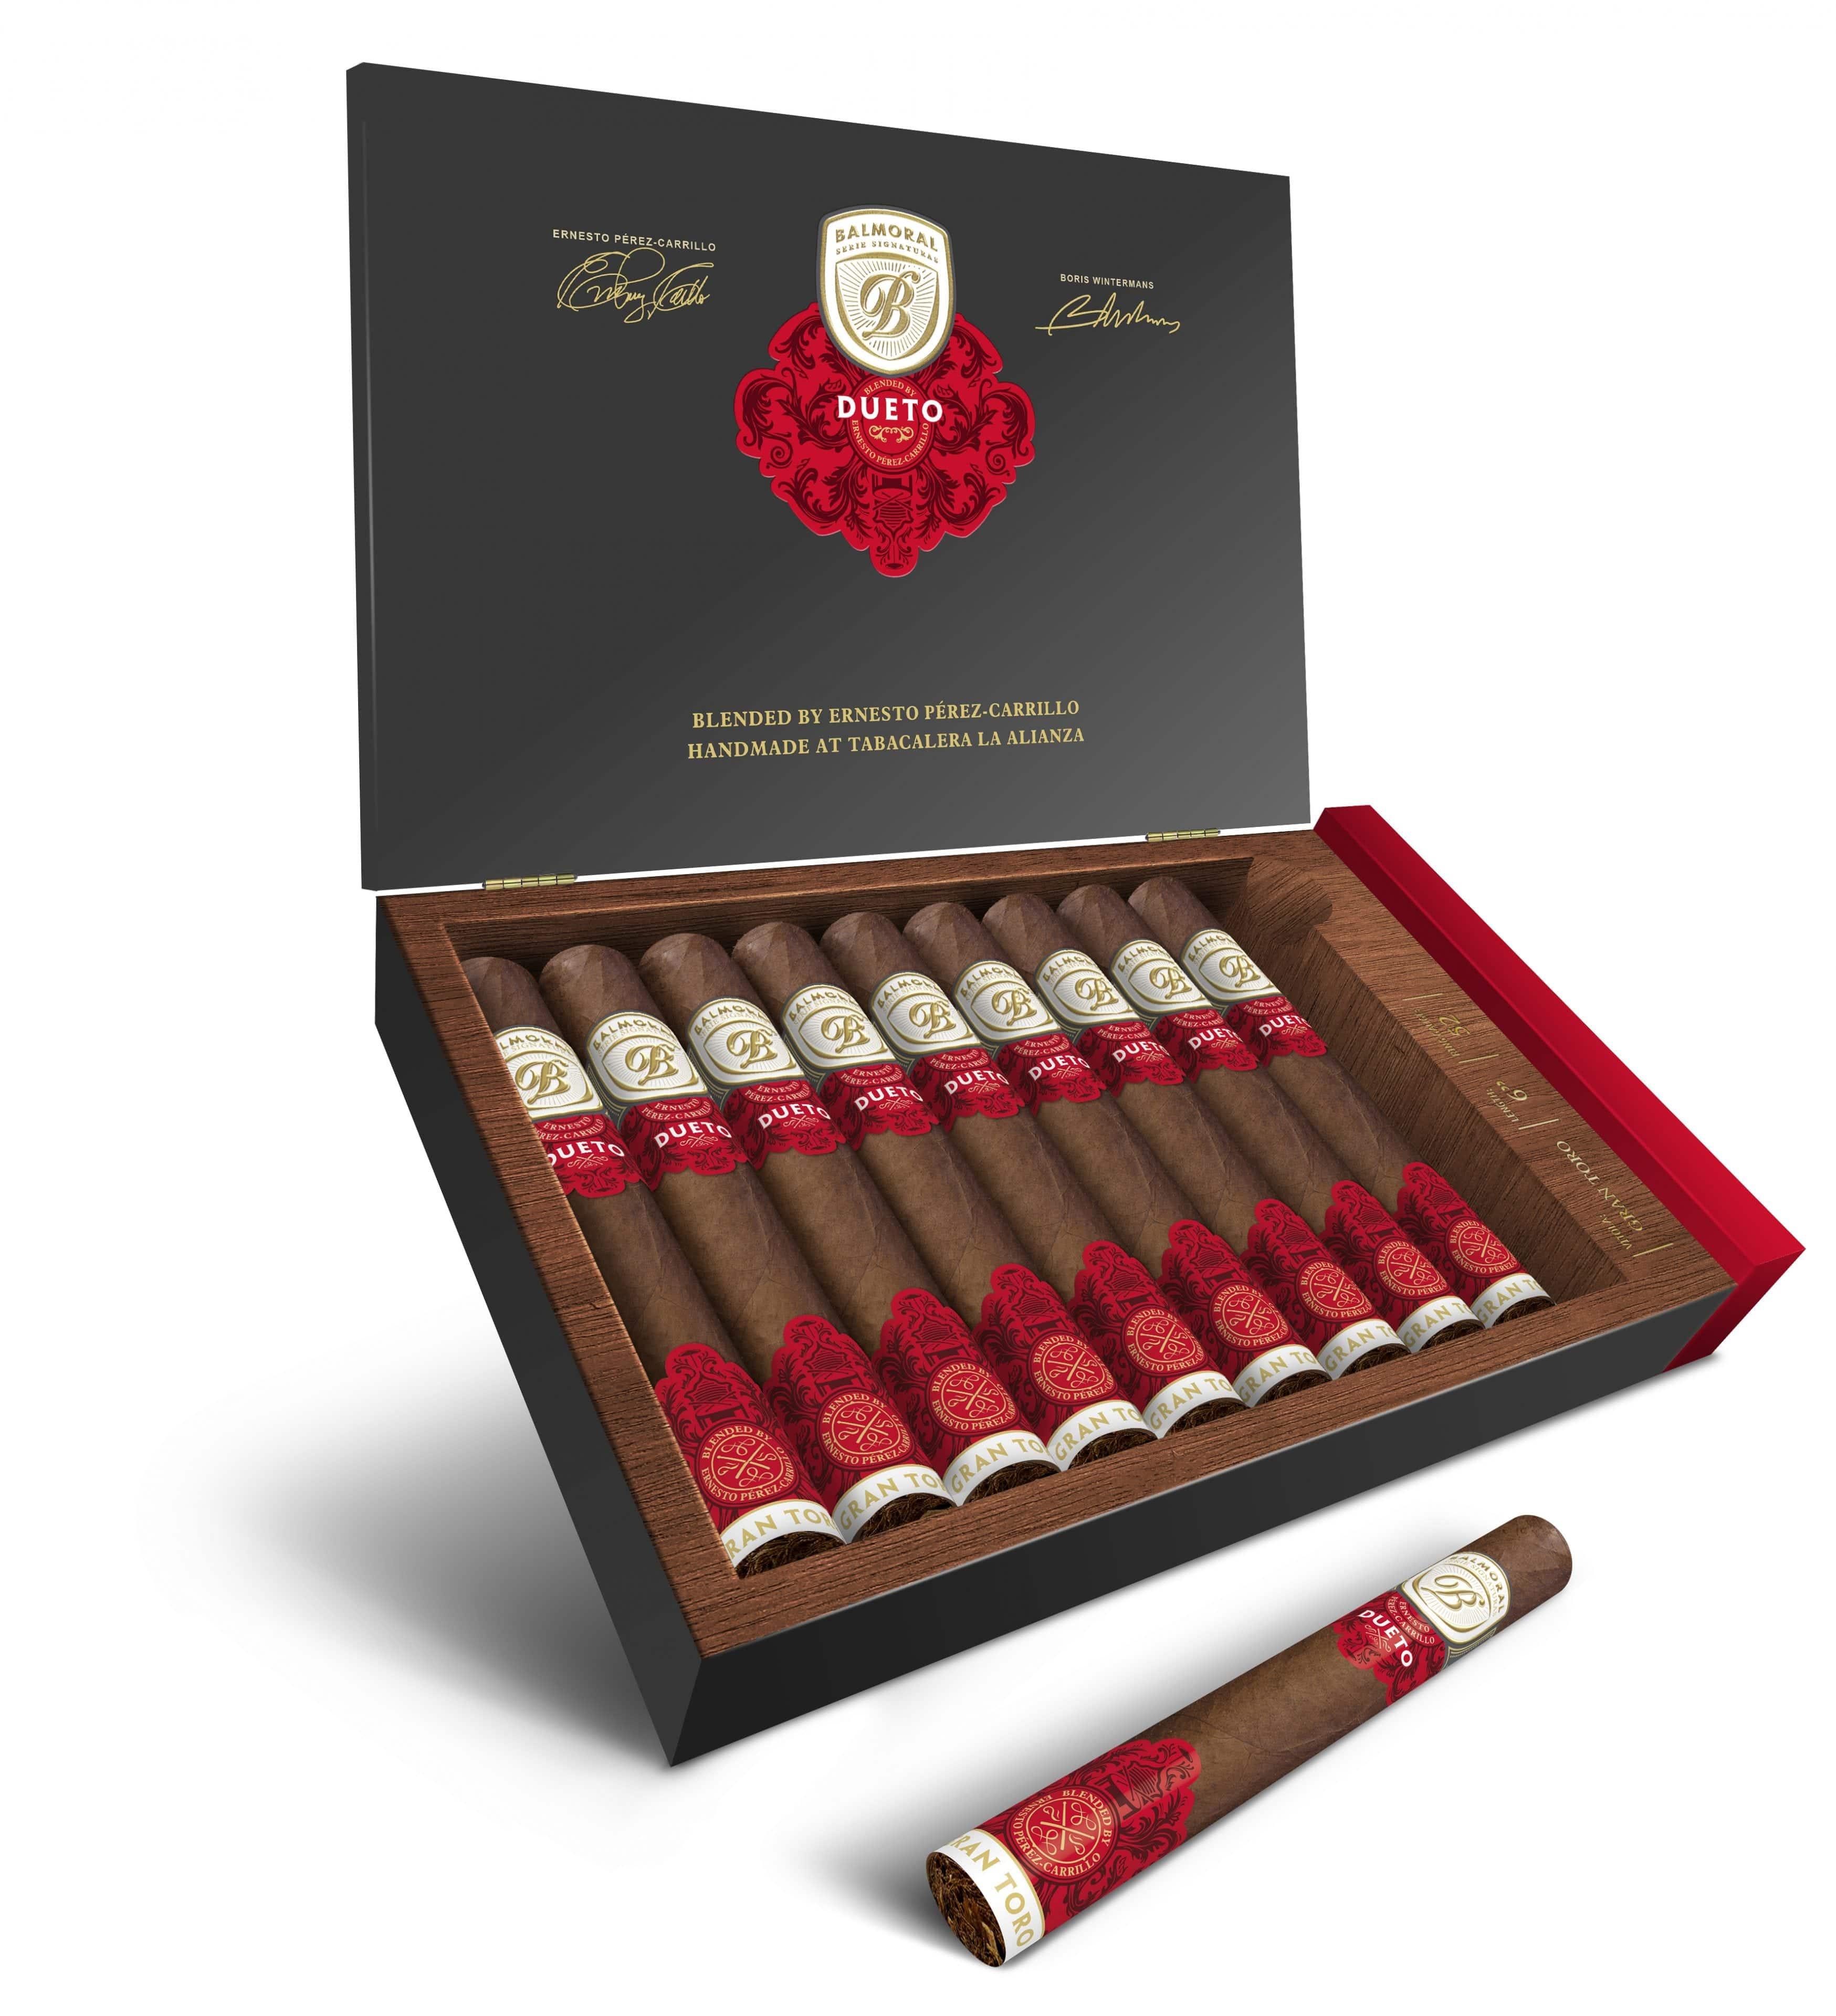 Cigar News: Carrillo-Agio Collaborate on DUETA Cigar